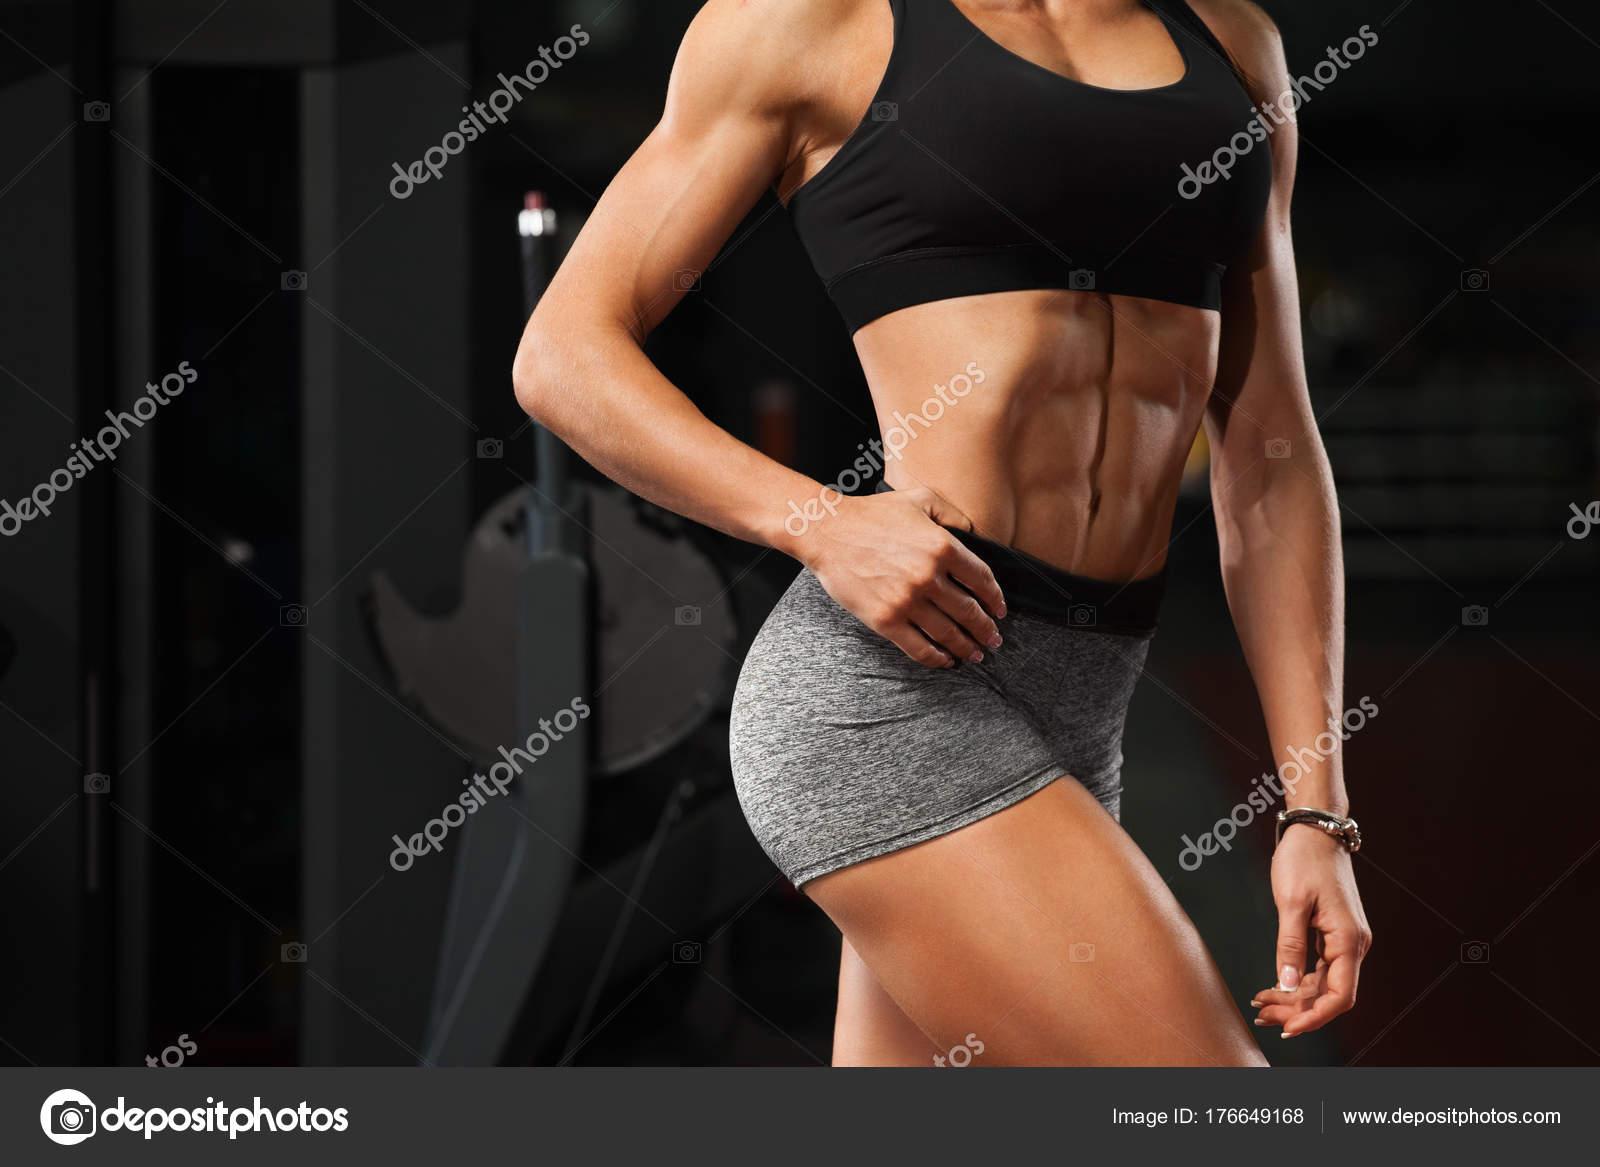 Fotos Abdominales Mujeres Mujer Sexy Fitness Mostrando